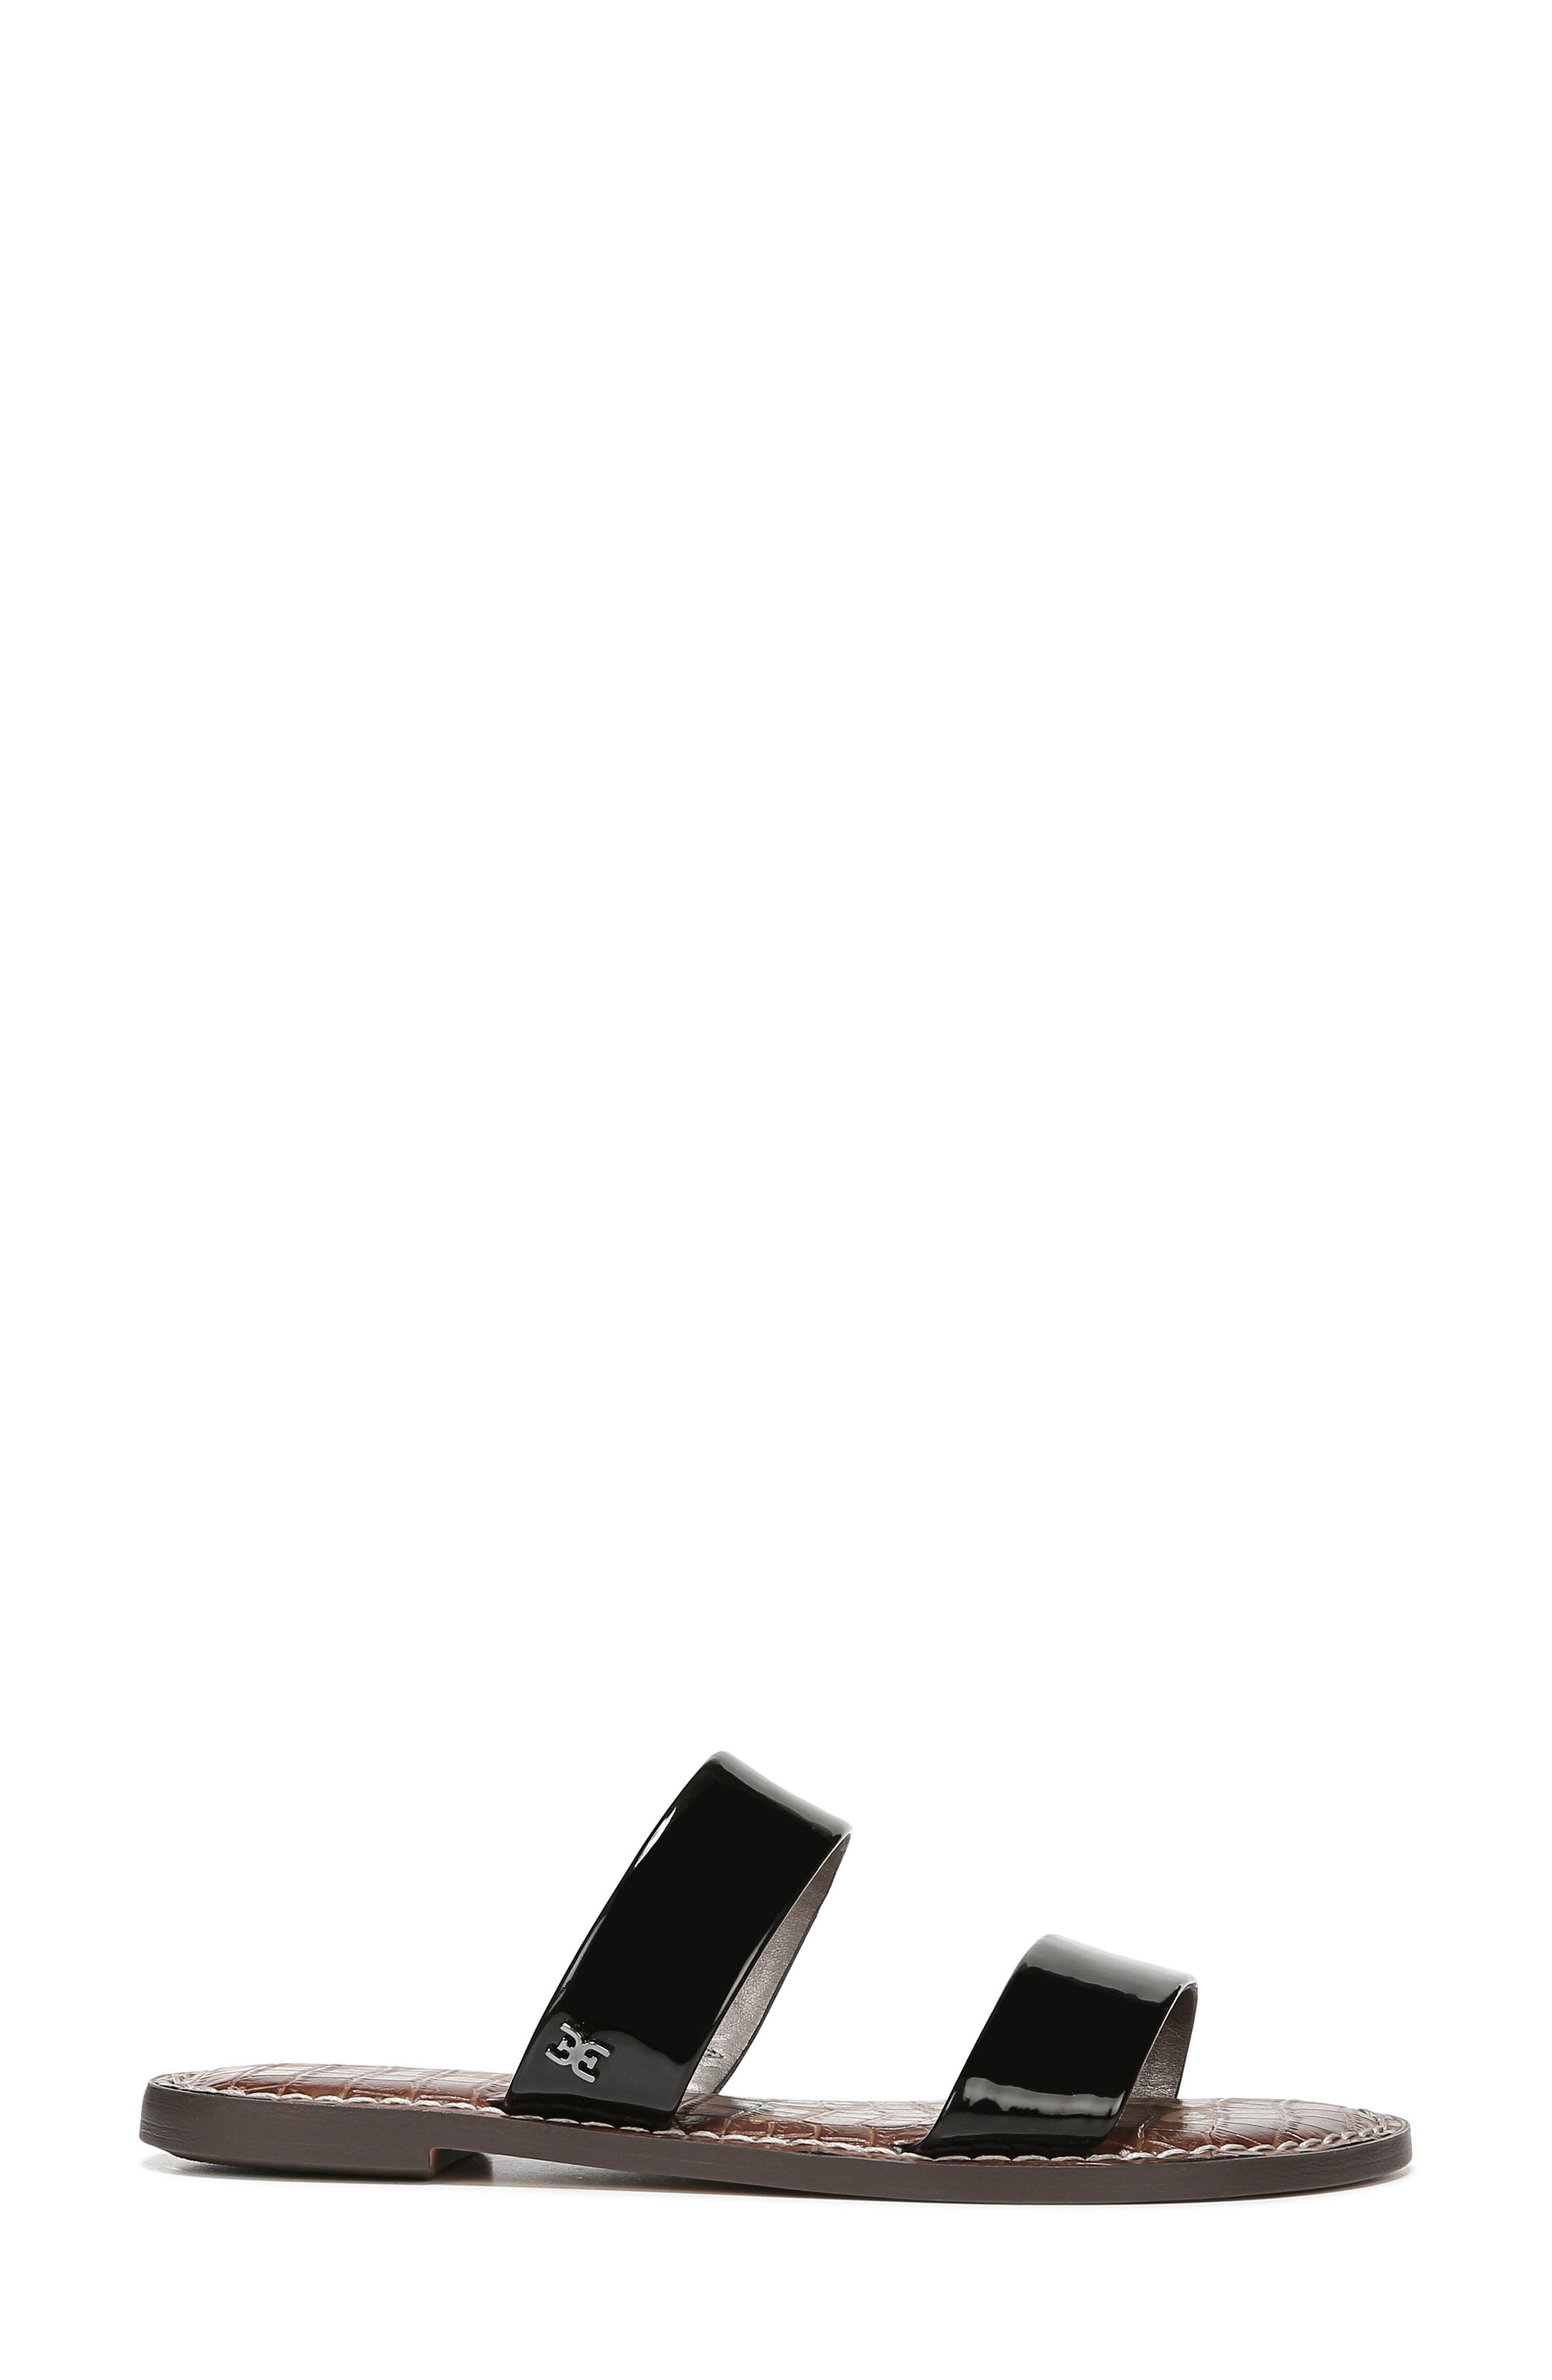 7bcb41d17 Sam Edelman - Black Women s Gala Slide Sandals - Lyst. View fullscreen